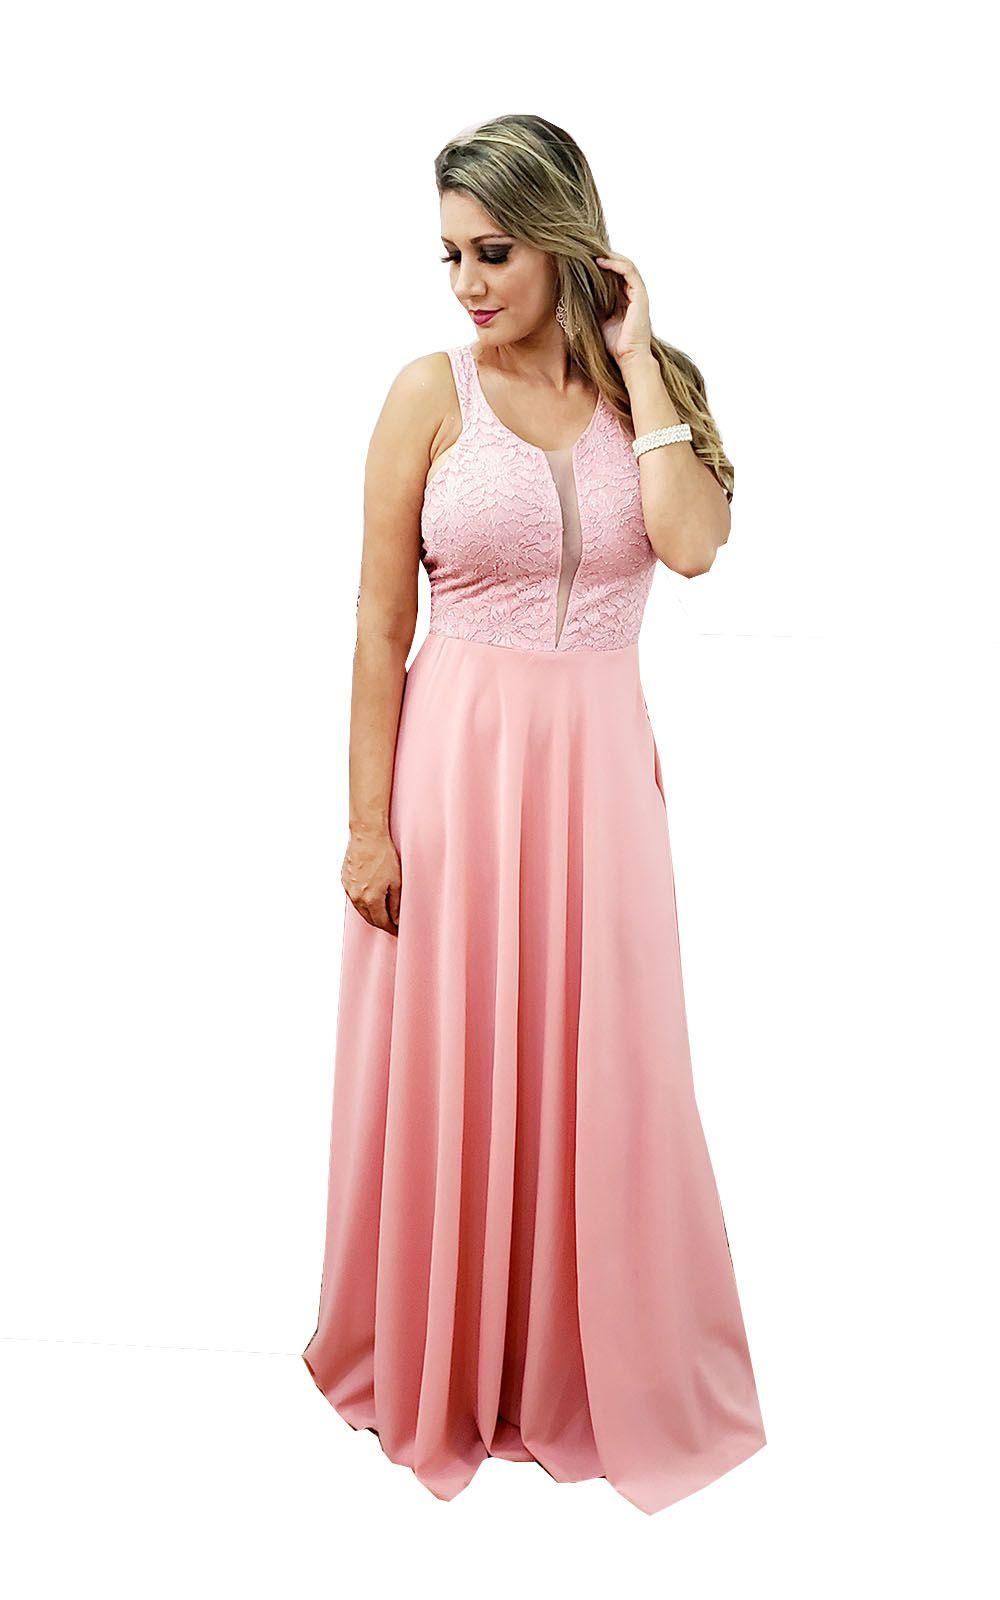 7811546f31 Vestido Festa Longo Rose